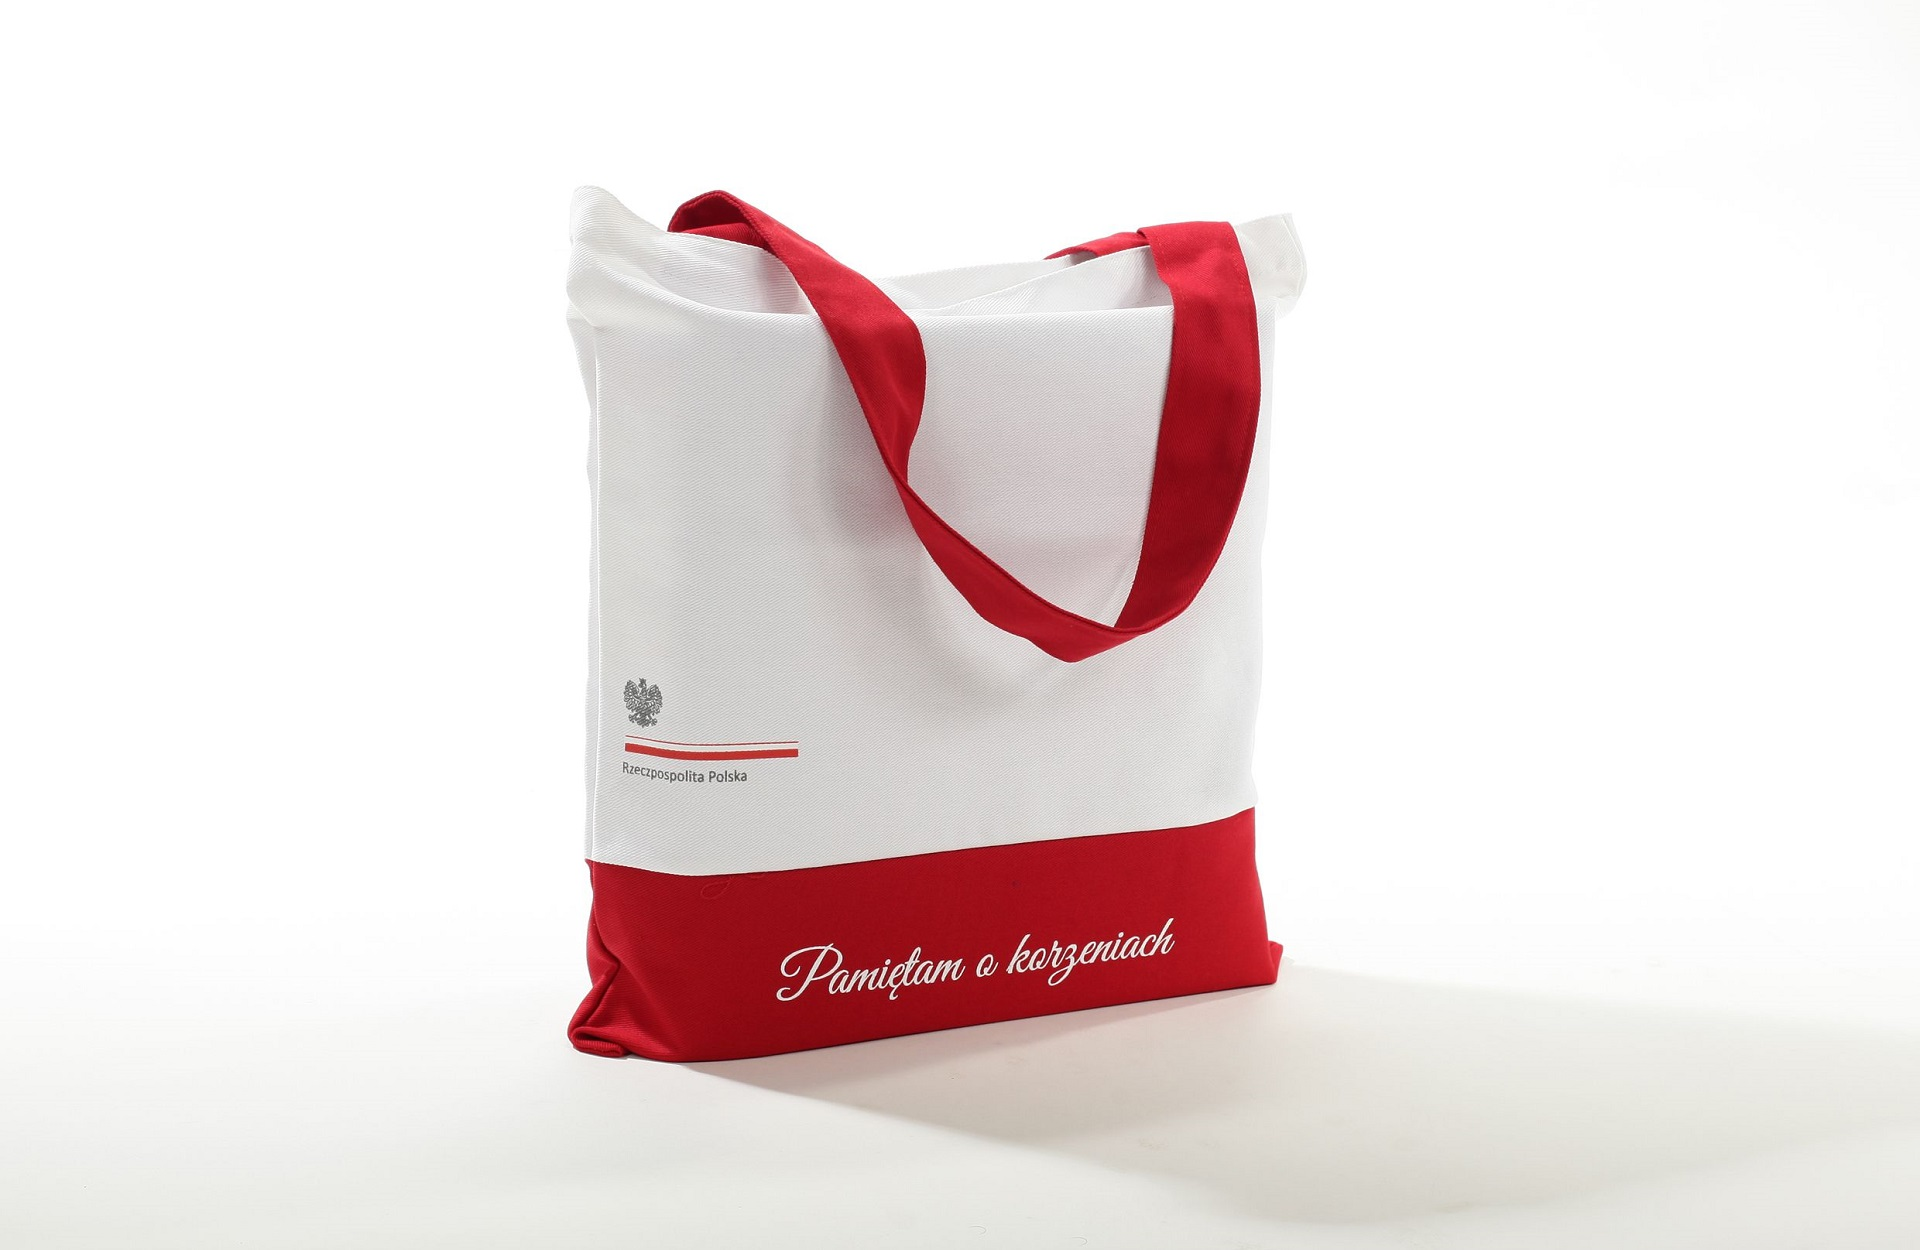 ea0a3a9b81d36 Torby bawełniane. Ekologiczne torby z nadrukiem. Producent Cotton ...